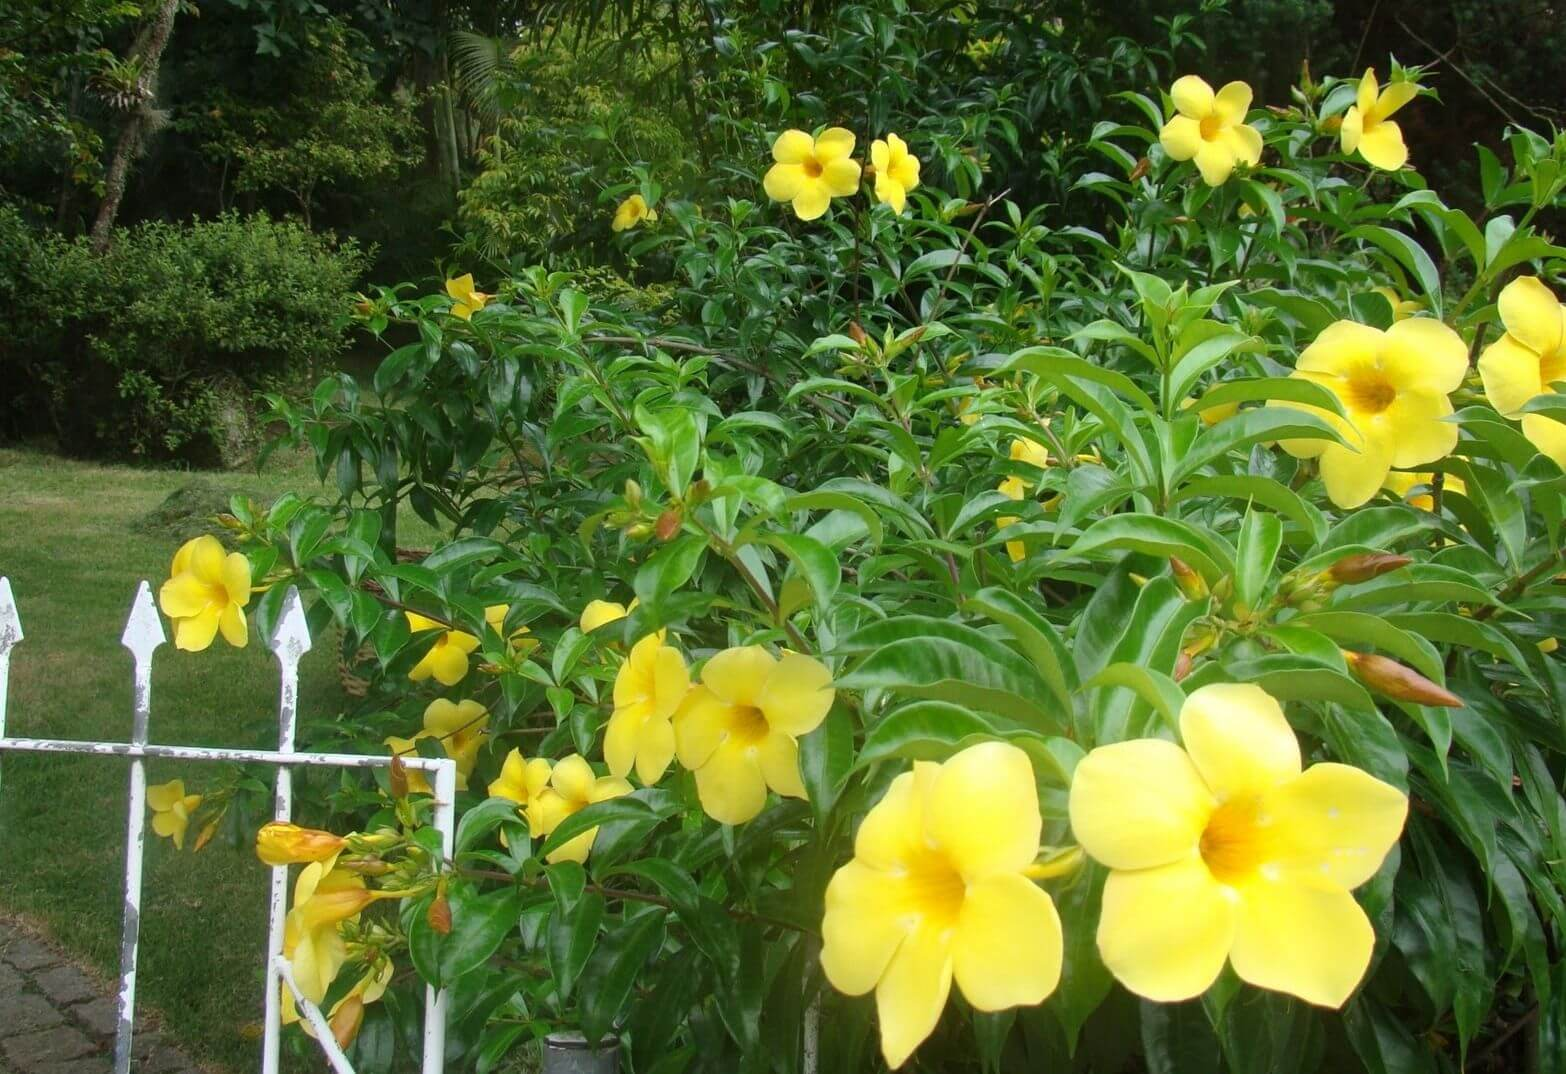 Alamanda flores que gostam de sol